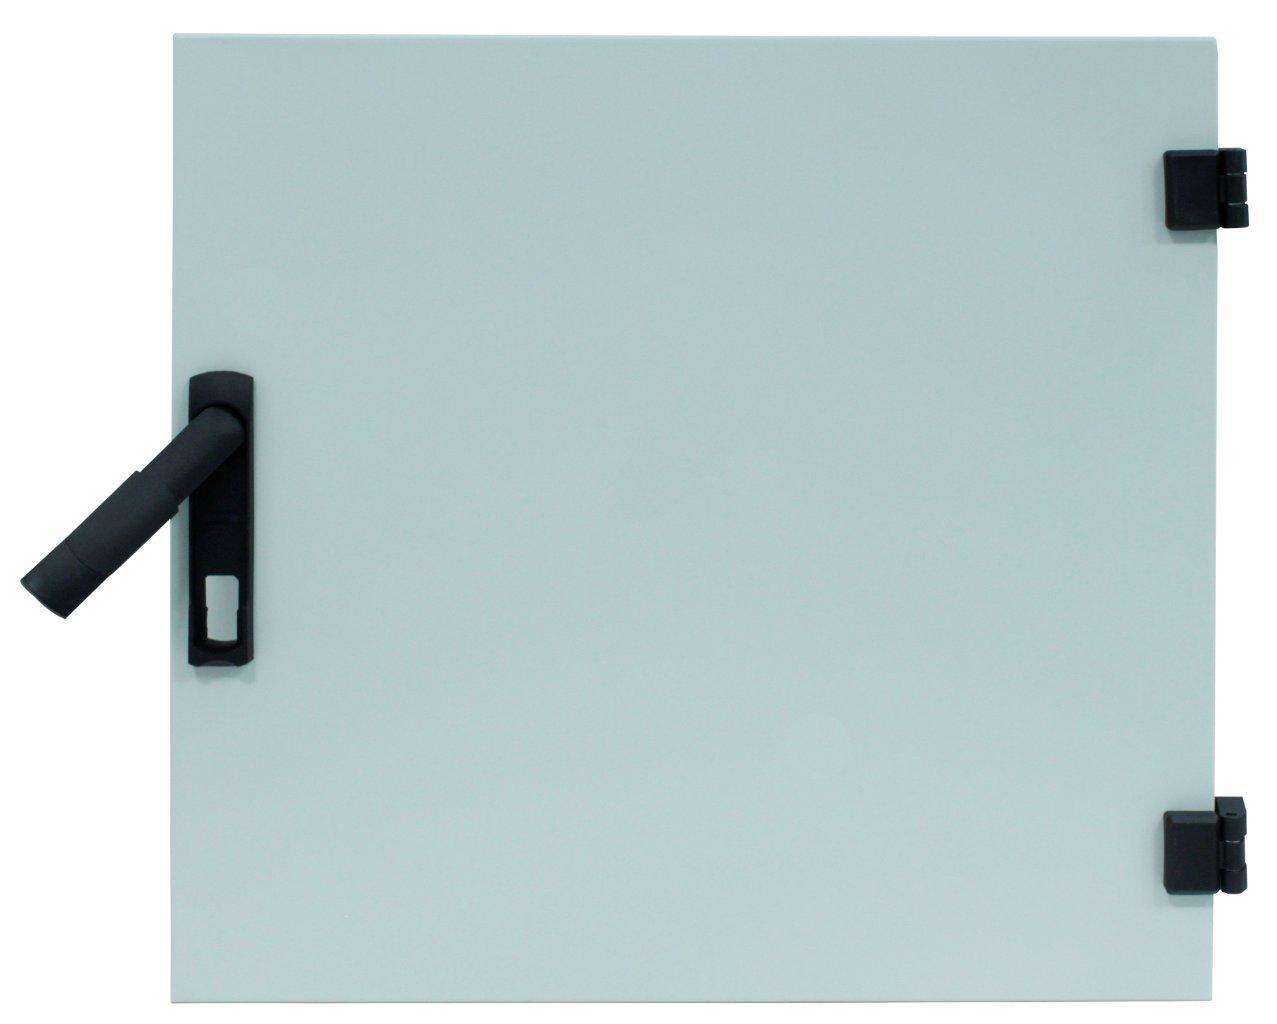 1 Stk Vollmetall-Tür f.DW-Schrank21HE,B600,RAL7035,HZ-Vorbereitung DWRT2166--